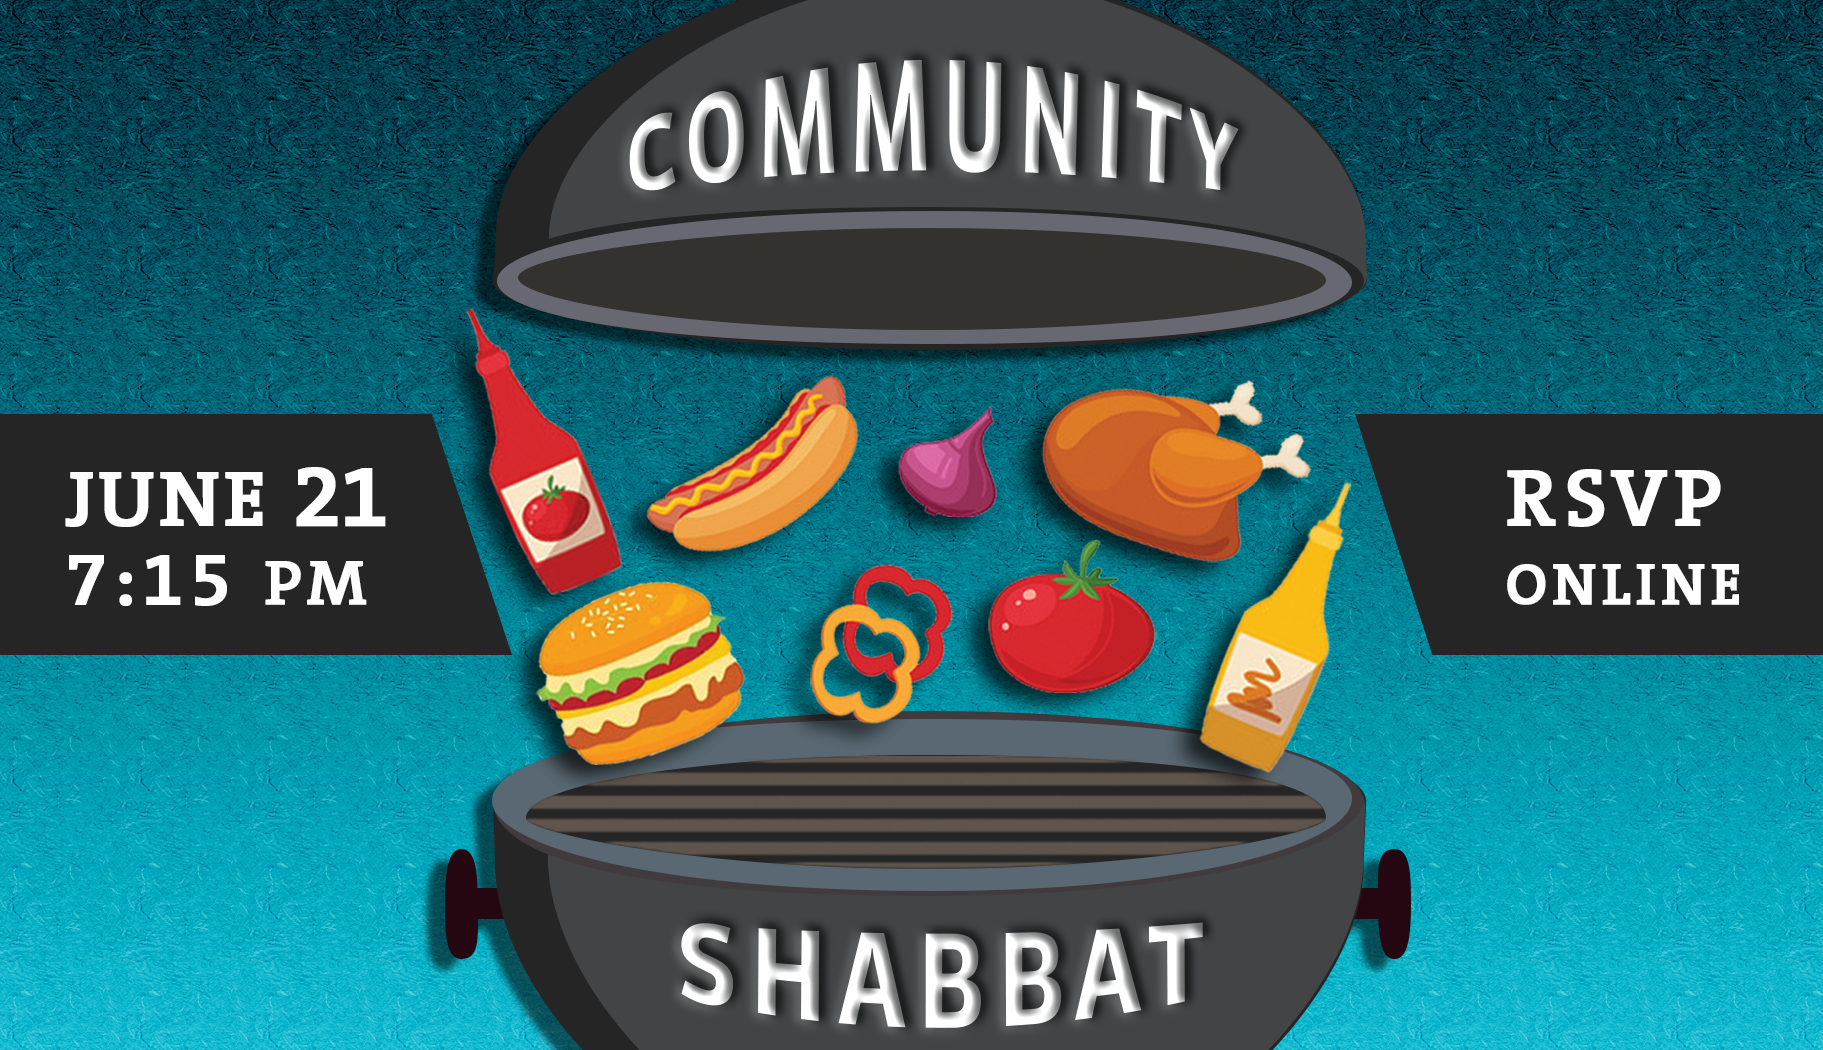 Community Shabbat